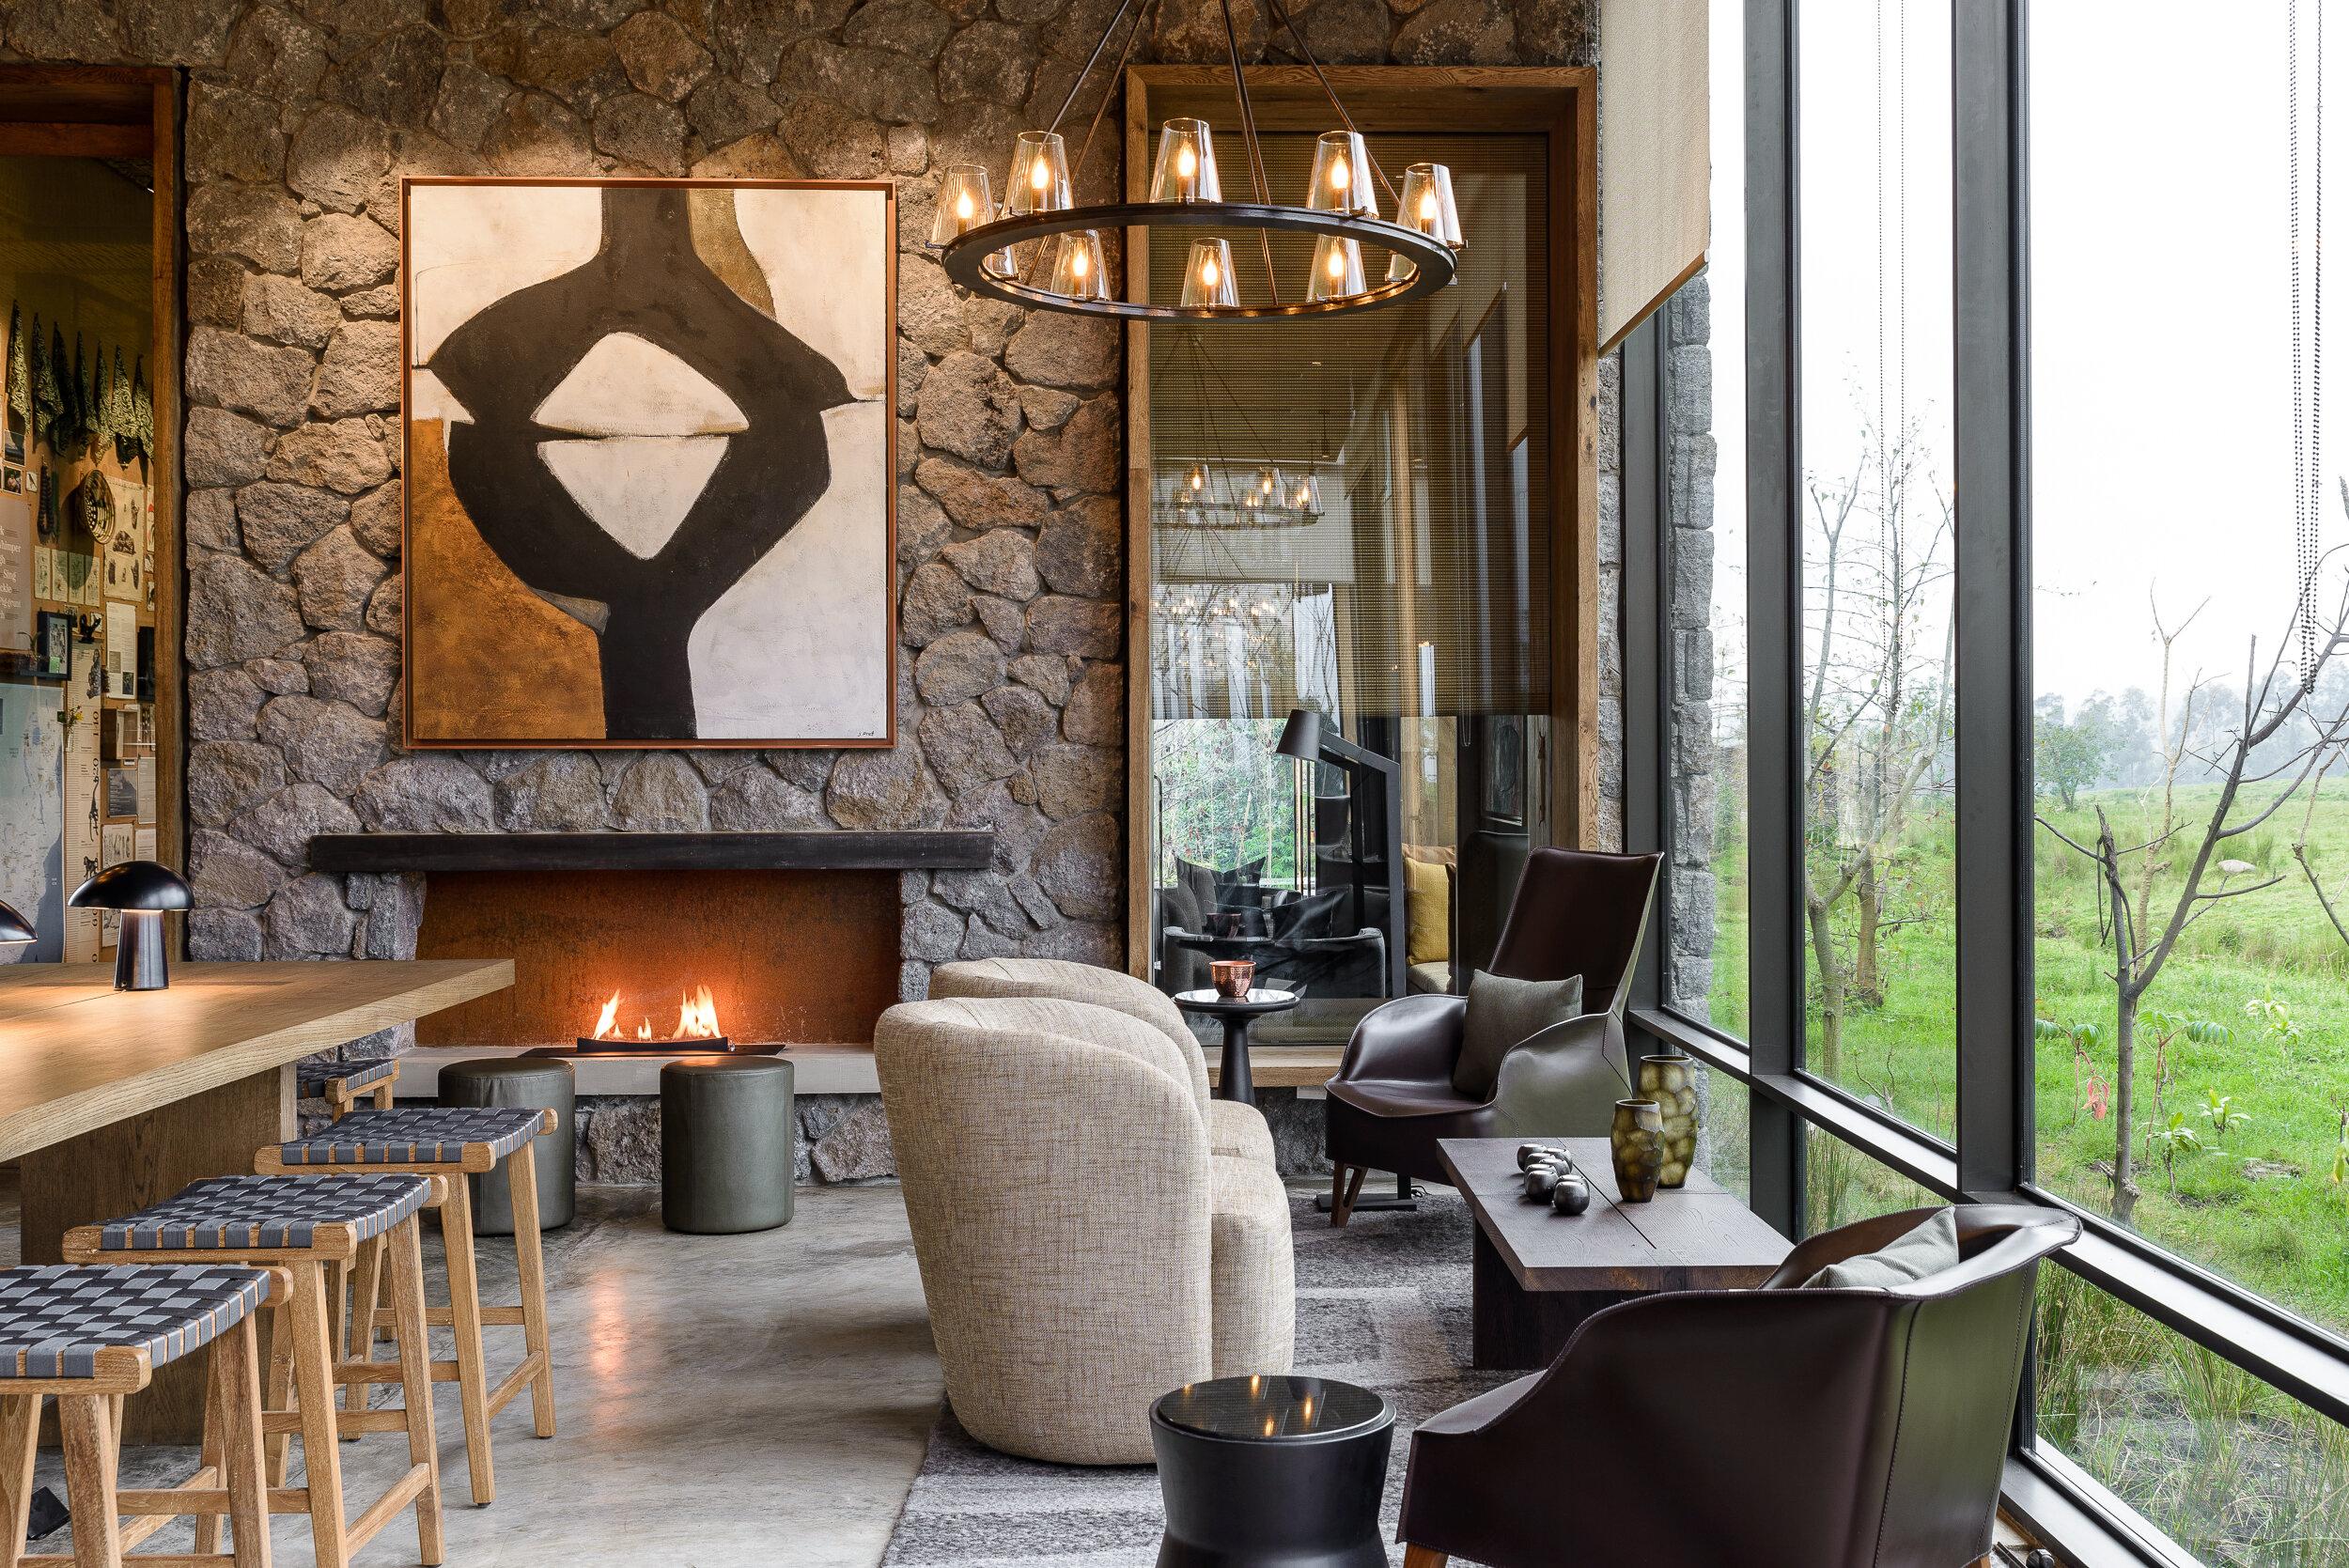 Singita-Kwitonda-Lodge-Lounge-Area-with-Fireplace.jpg